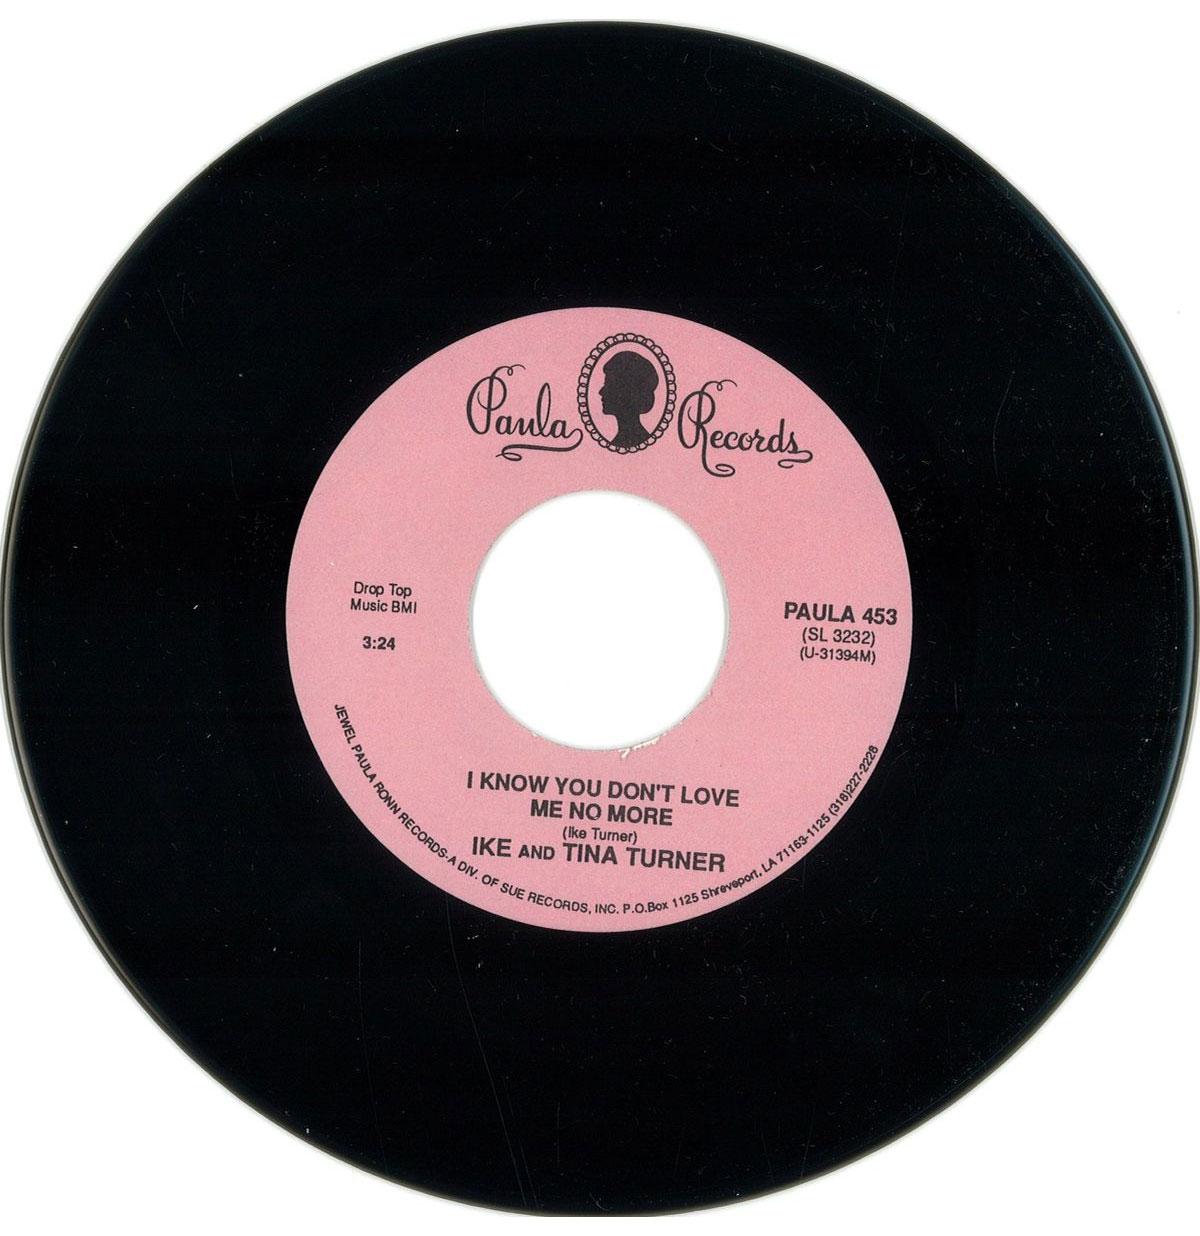 Single: Ike & Tina Turner - I Know You Don't Love Me No More